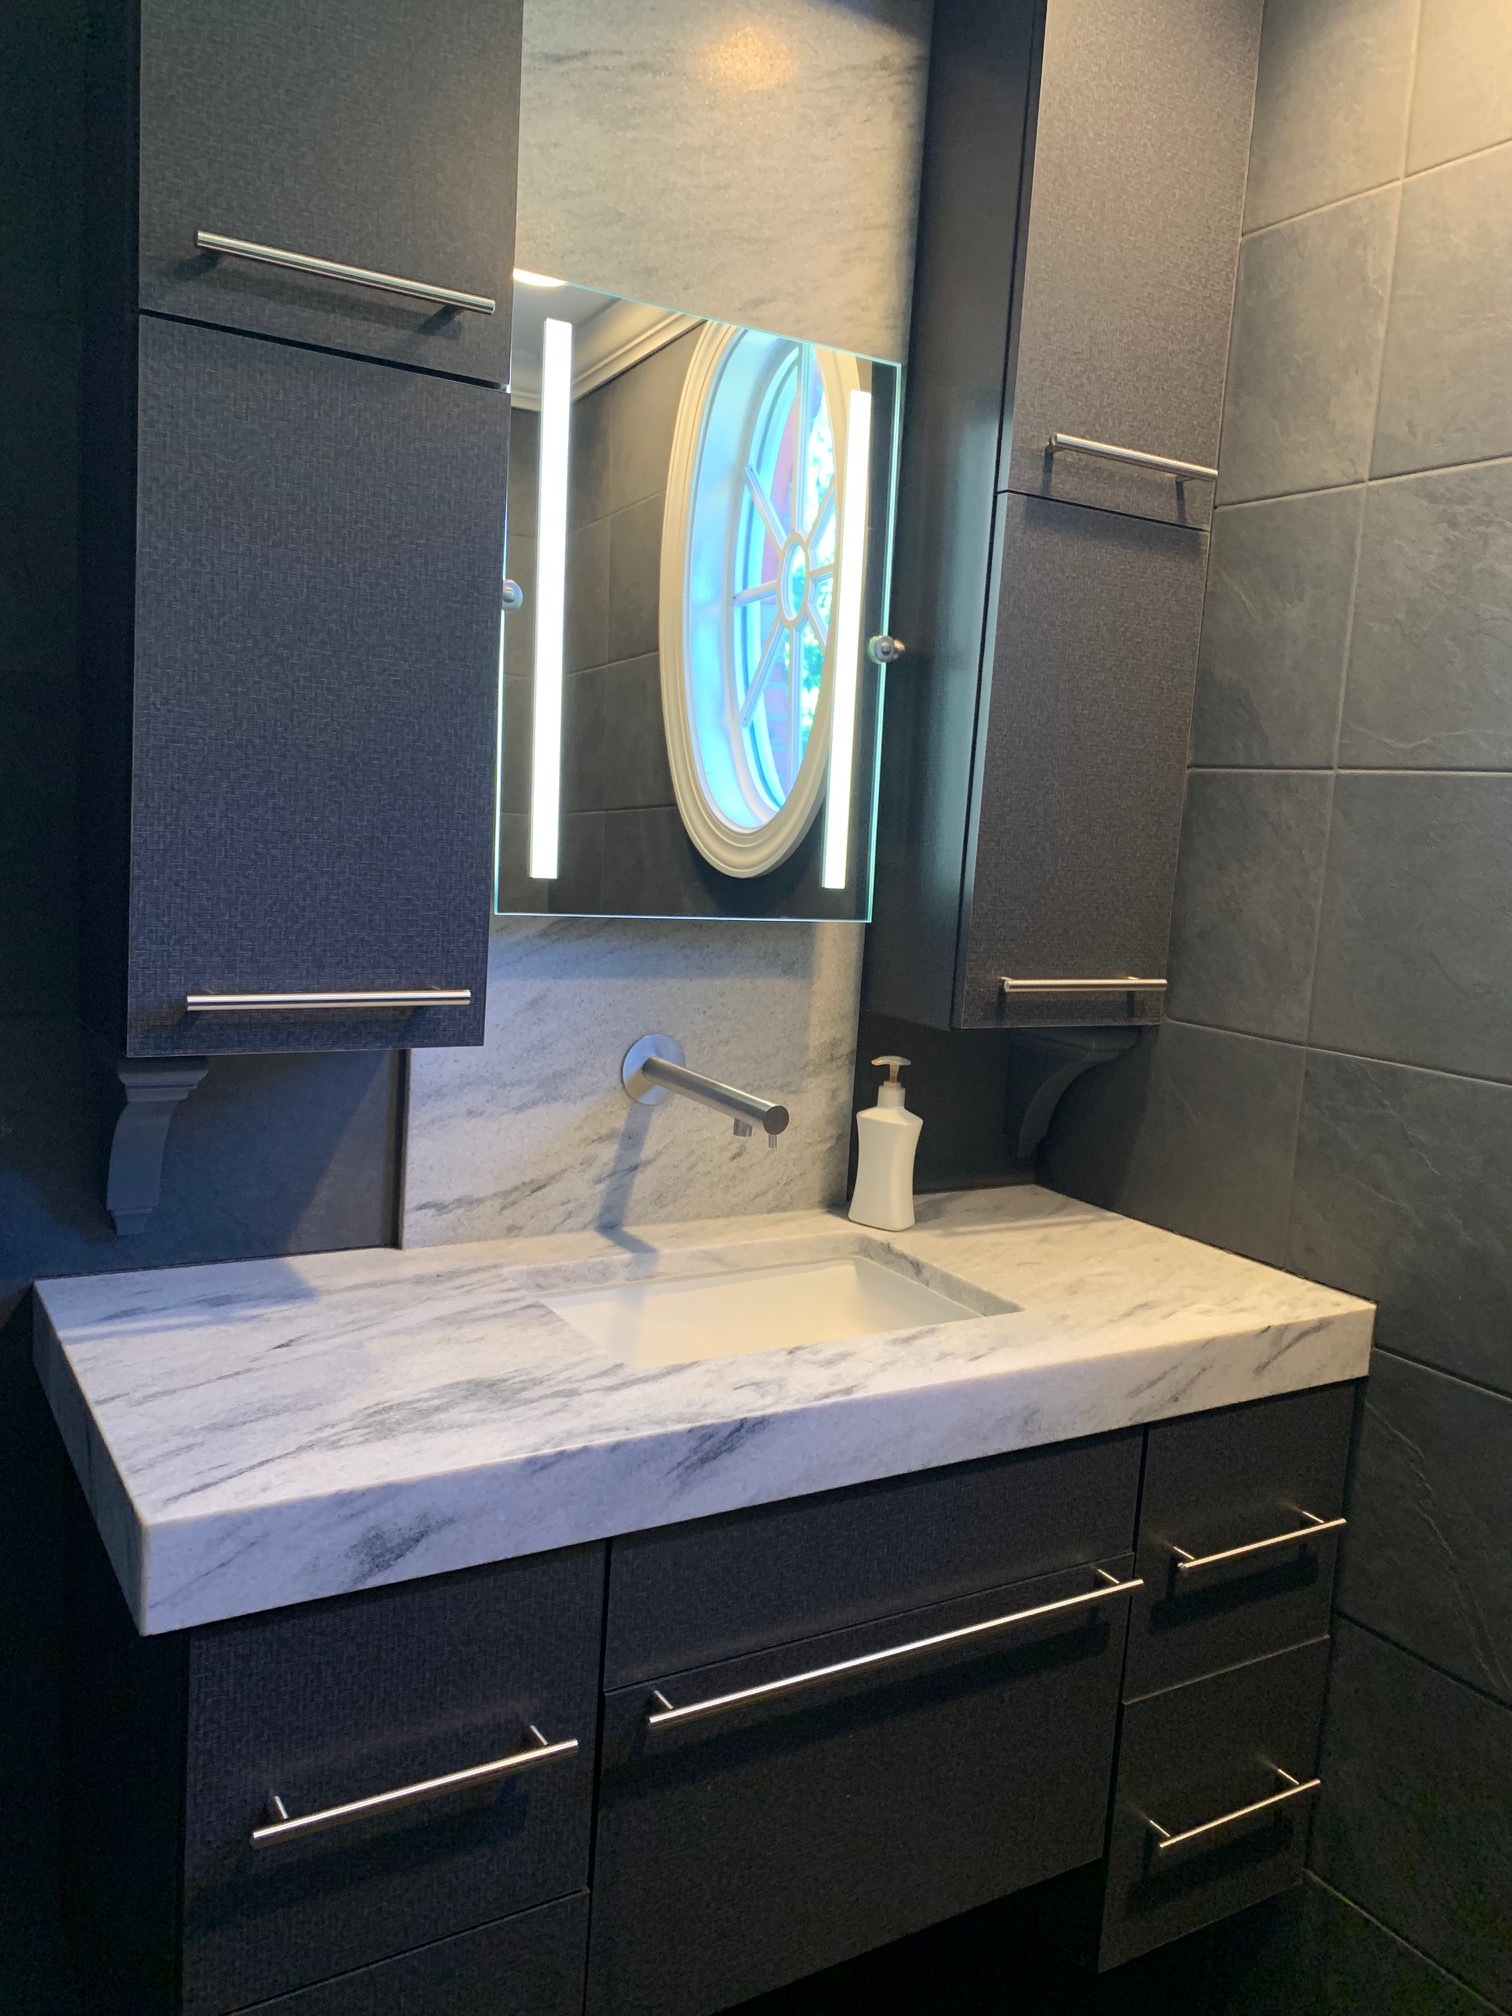 Custom Laminate Vanity with Doors, Drawers, and Corbels